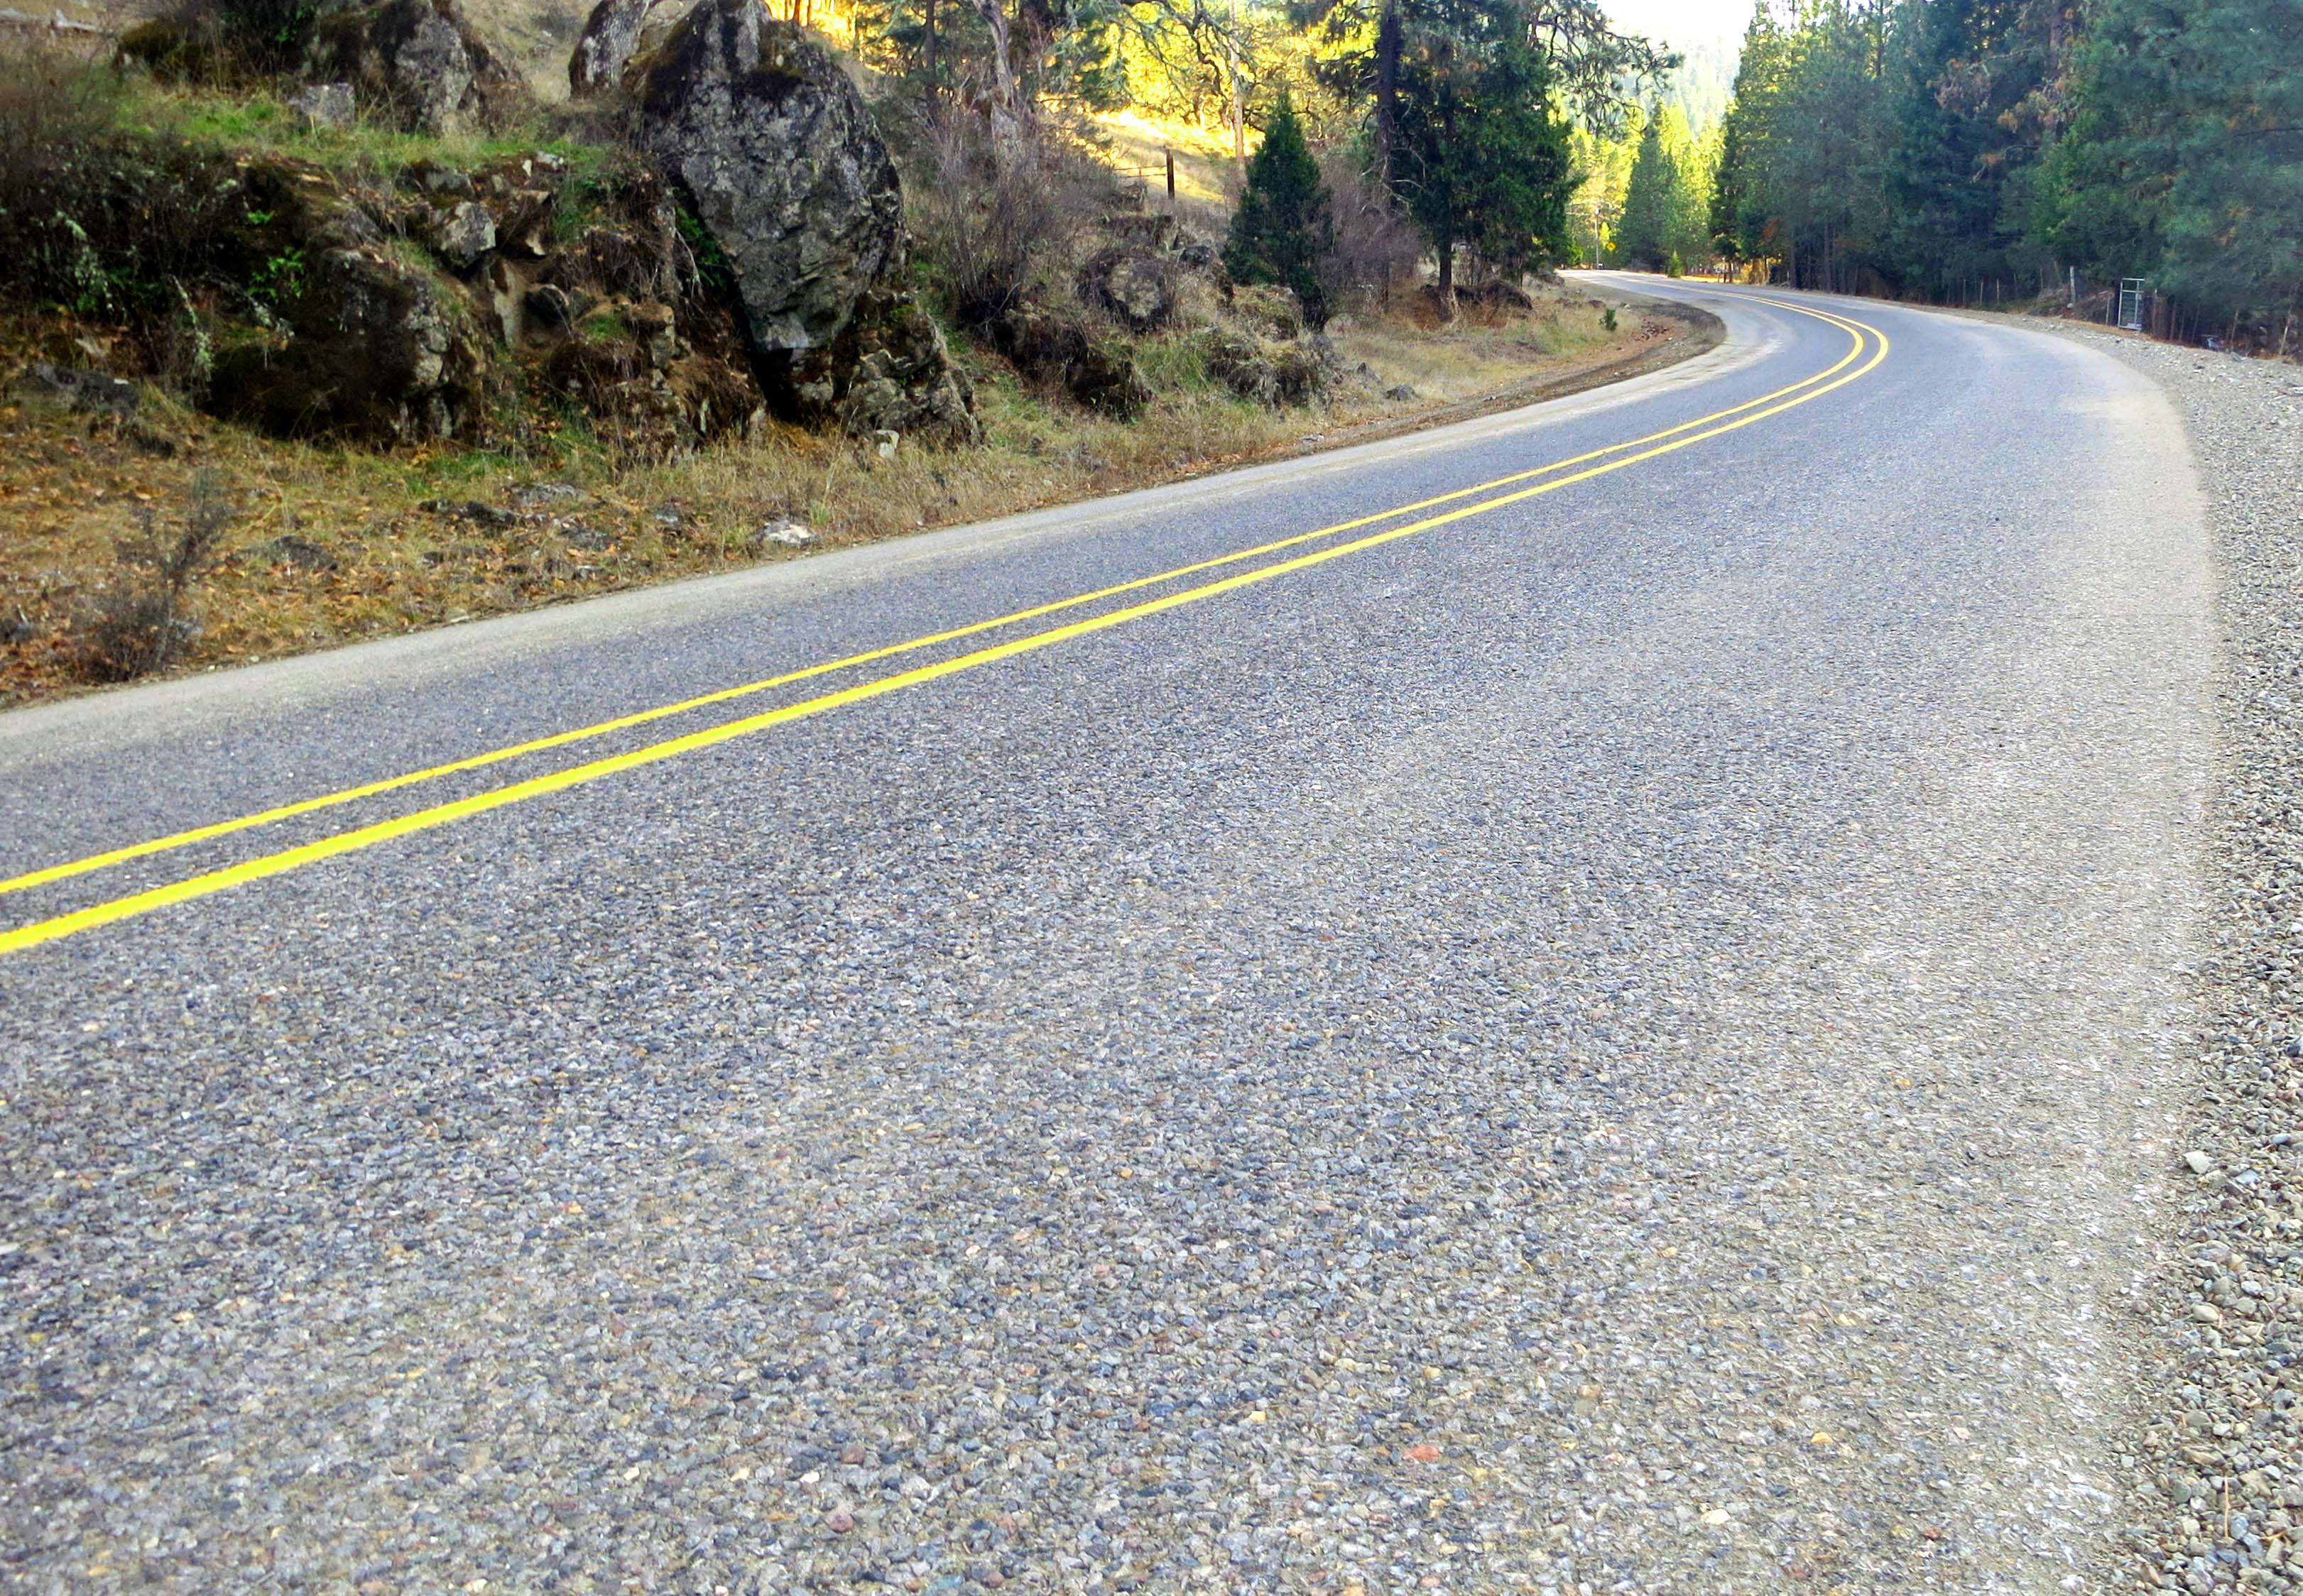 Upper Applegate Road, Southern Oregon. Photo by Curtis Mekemson.